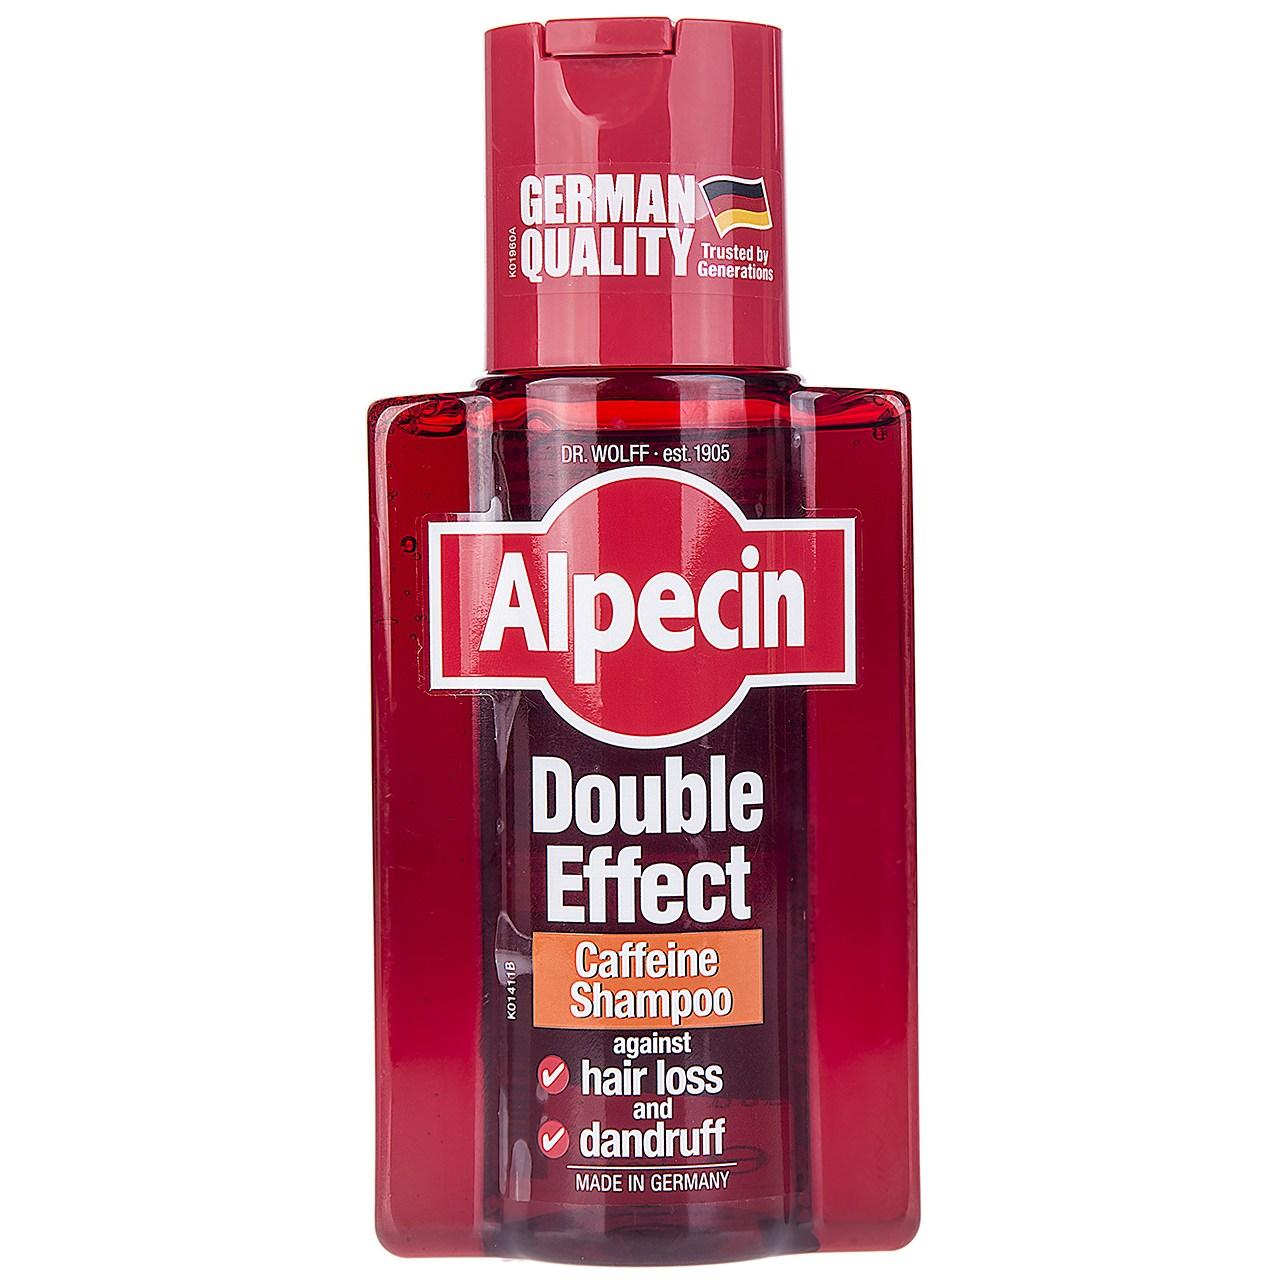 قیمت شامپو ضد شوره و تقویت کننده آلپسین مدل Double Effect Caffeine حجم 200 میلی لیتر